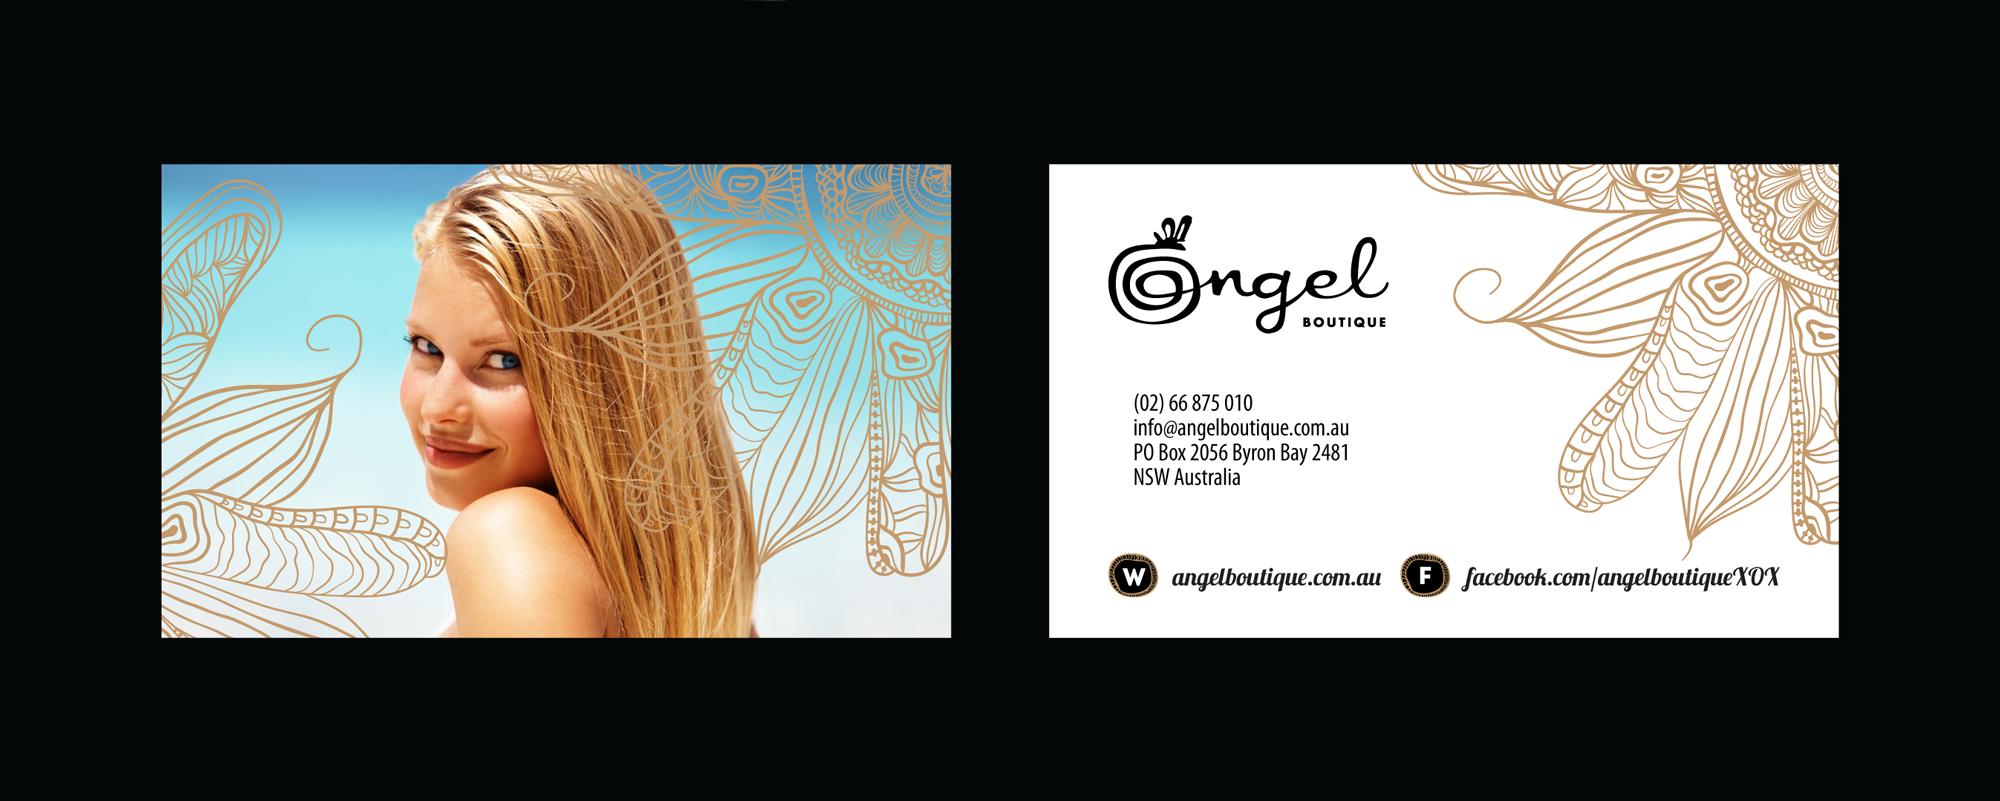 Angel_boutique_business_card_design.png